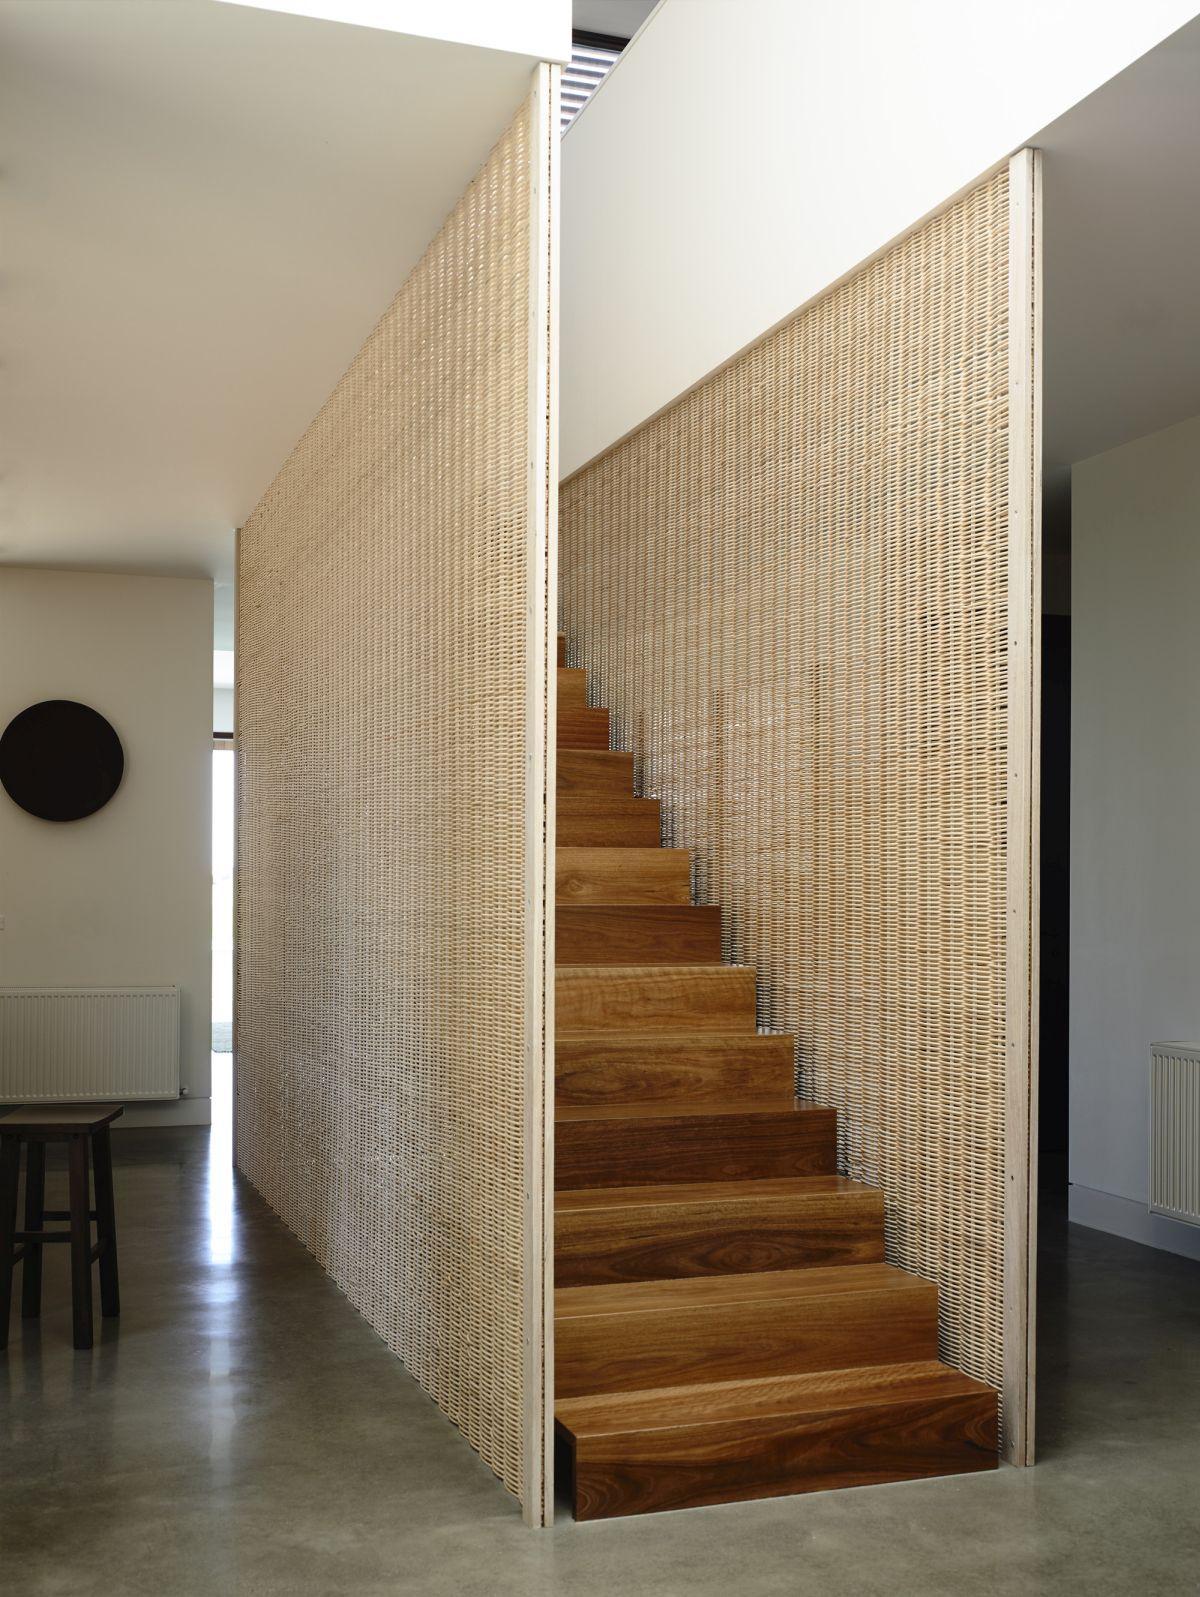 Divisori In Legno Interni exploring pattern designs, die treppen screens hervorstechen